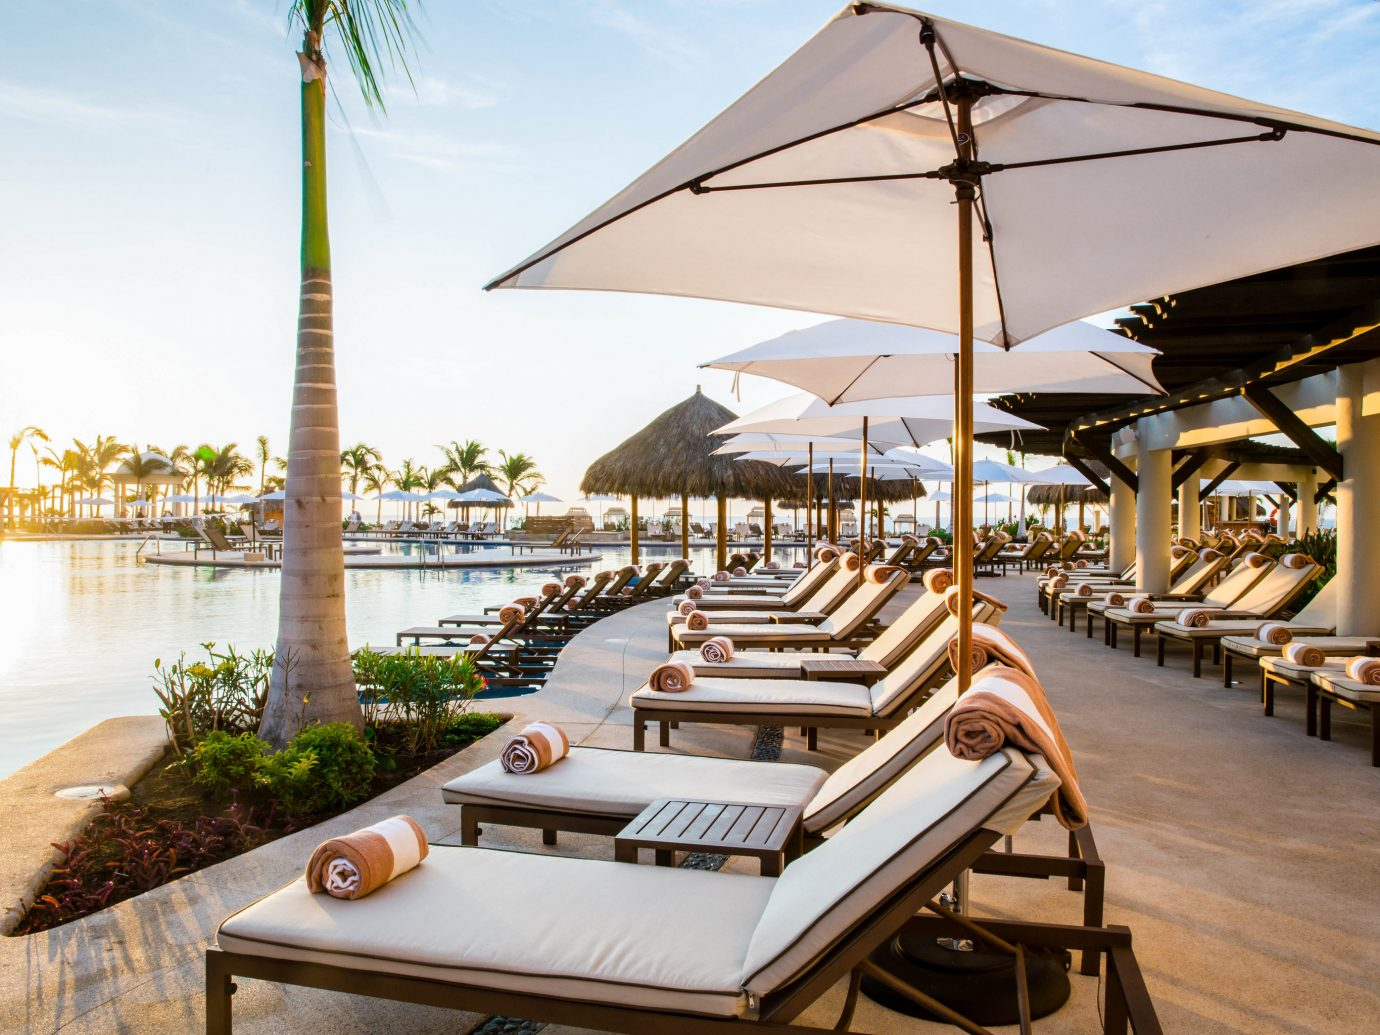 Budget Hotels sky outdoor Resort vacation estate restaurant Villa home outdoor structure several